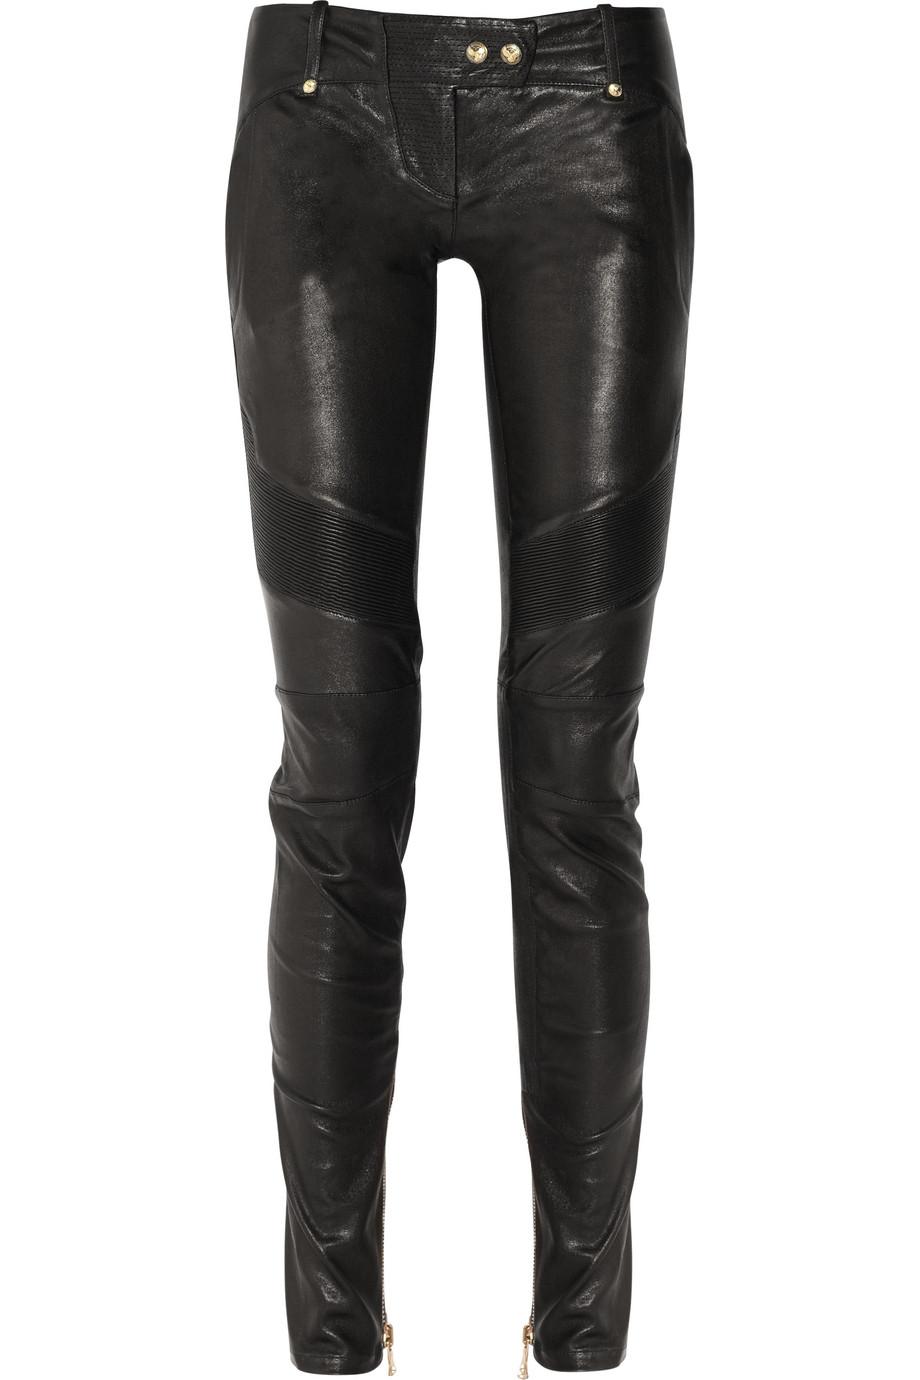 Balmain Skinny Leather Pants in Black | Lyst